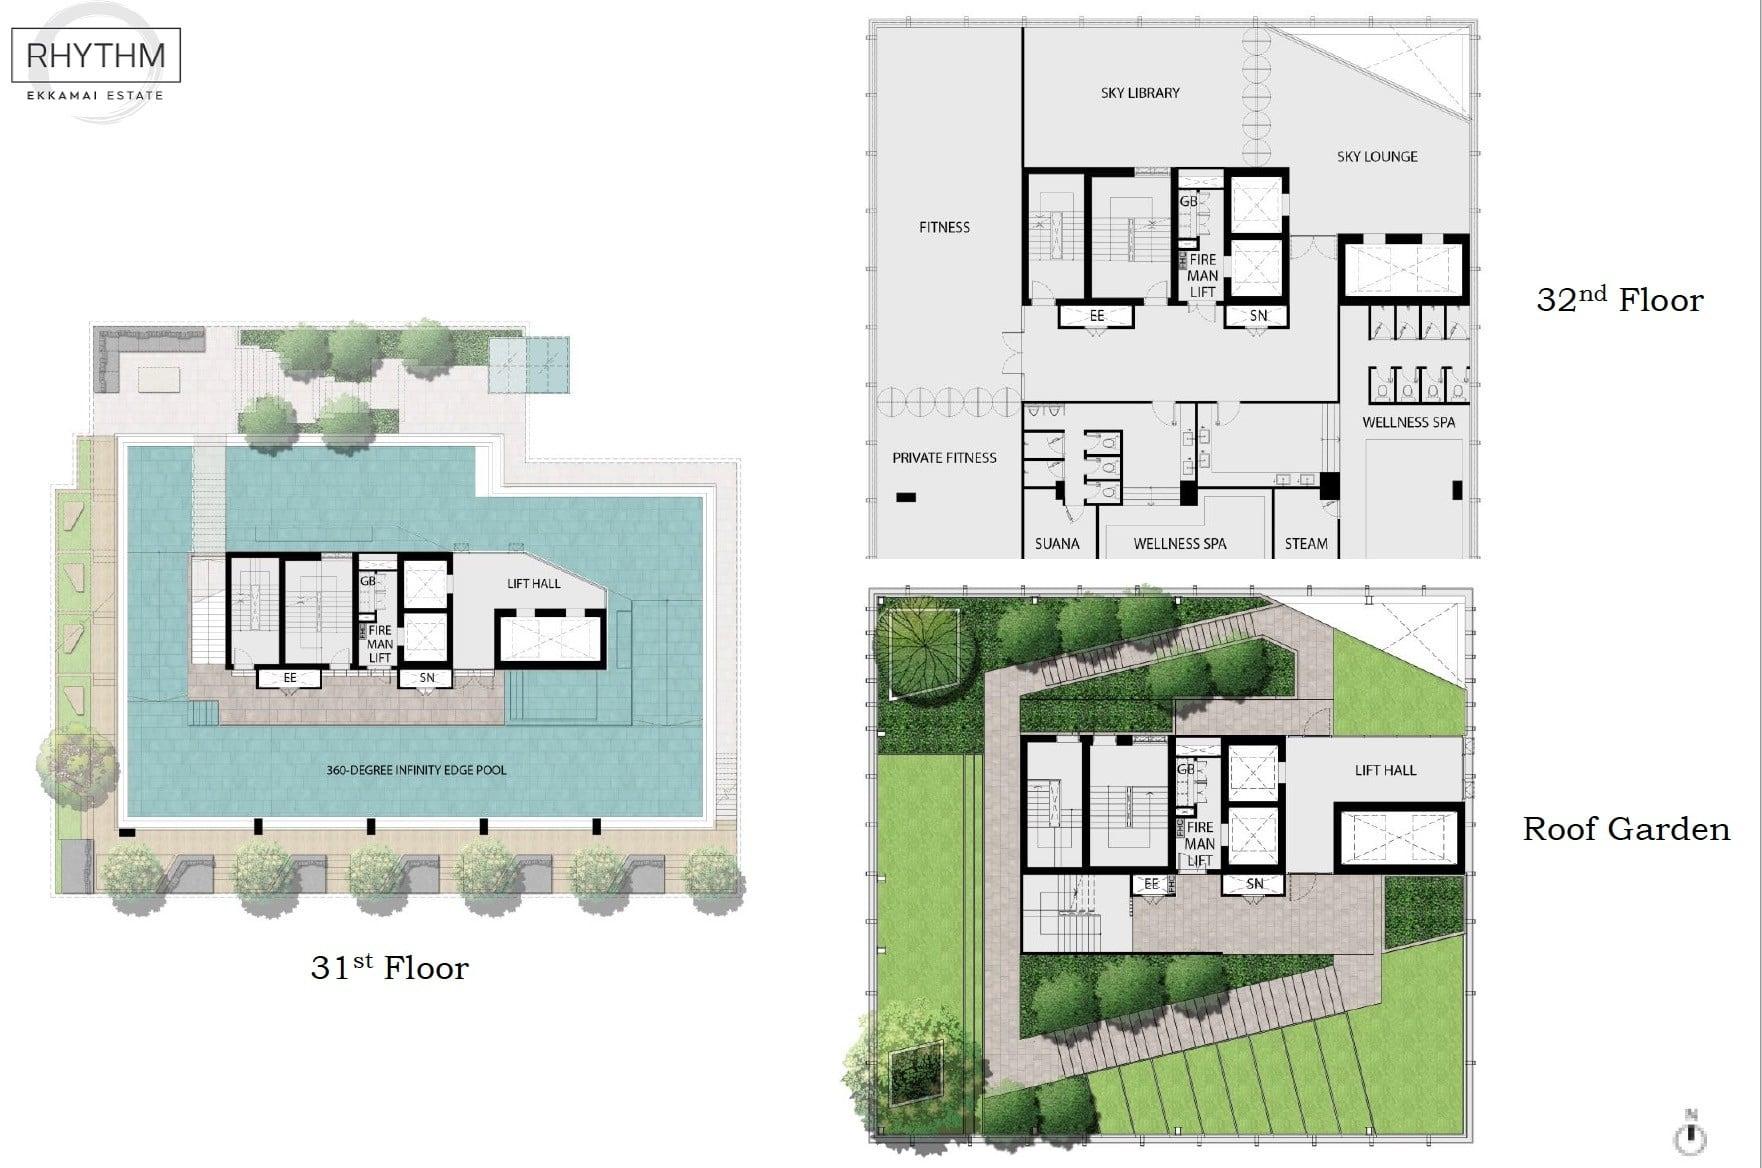 Rhythm-Ekkamai-Estate-Facilities Deck High